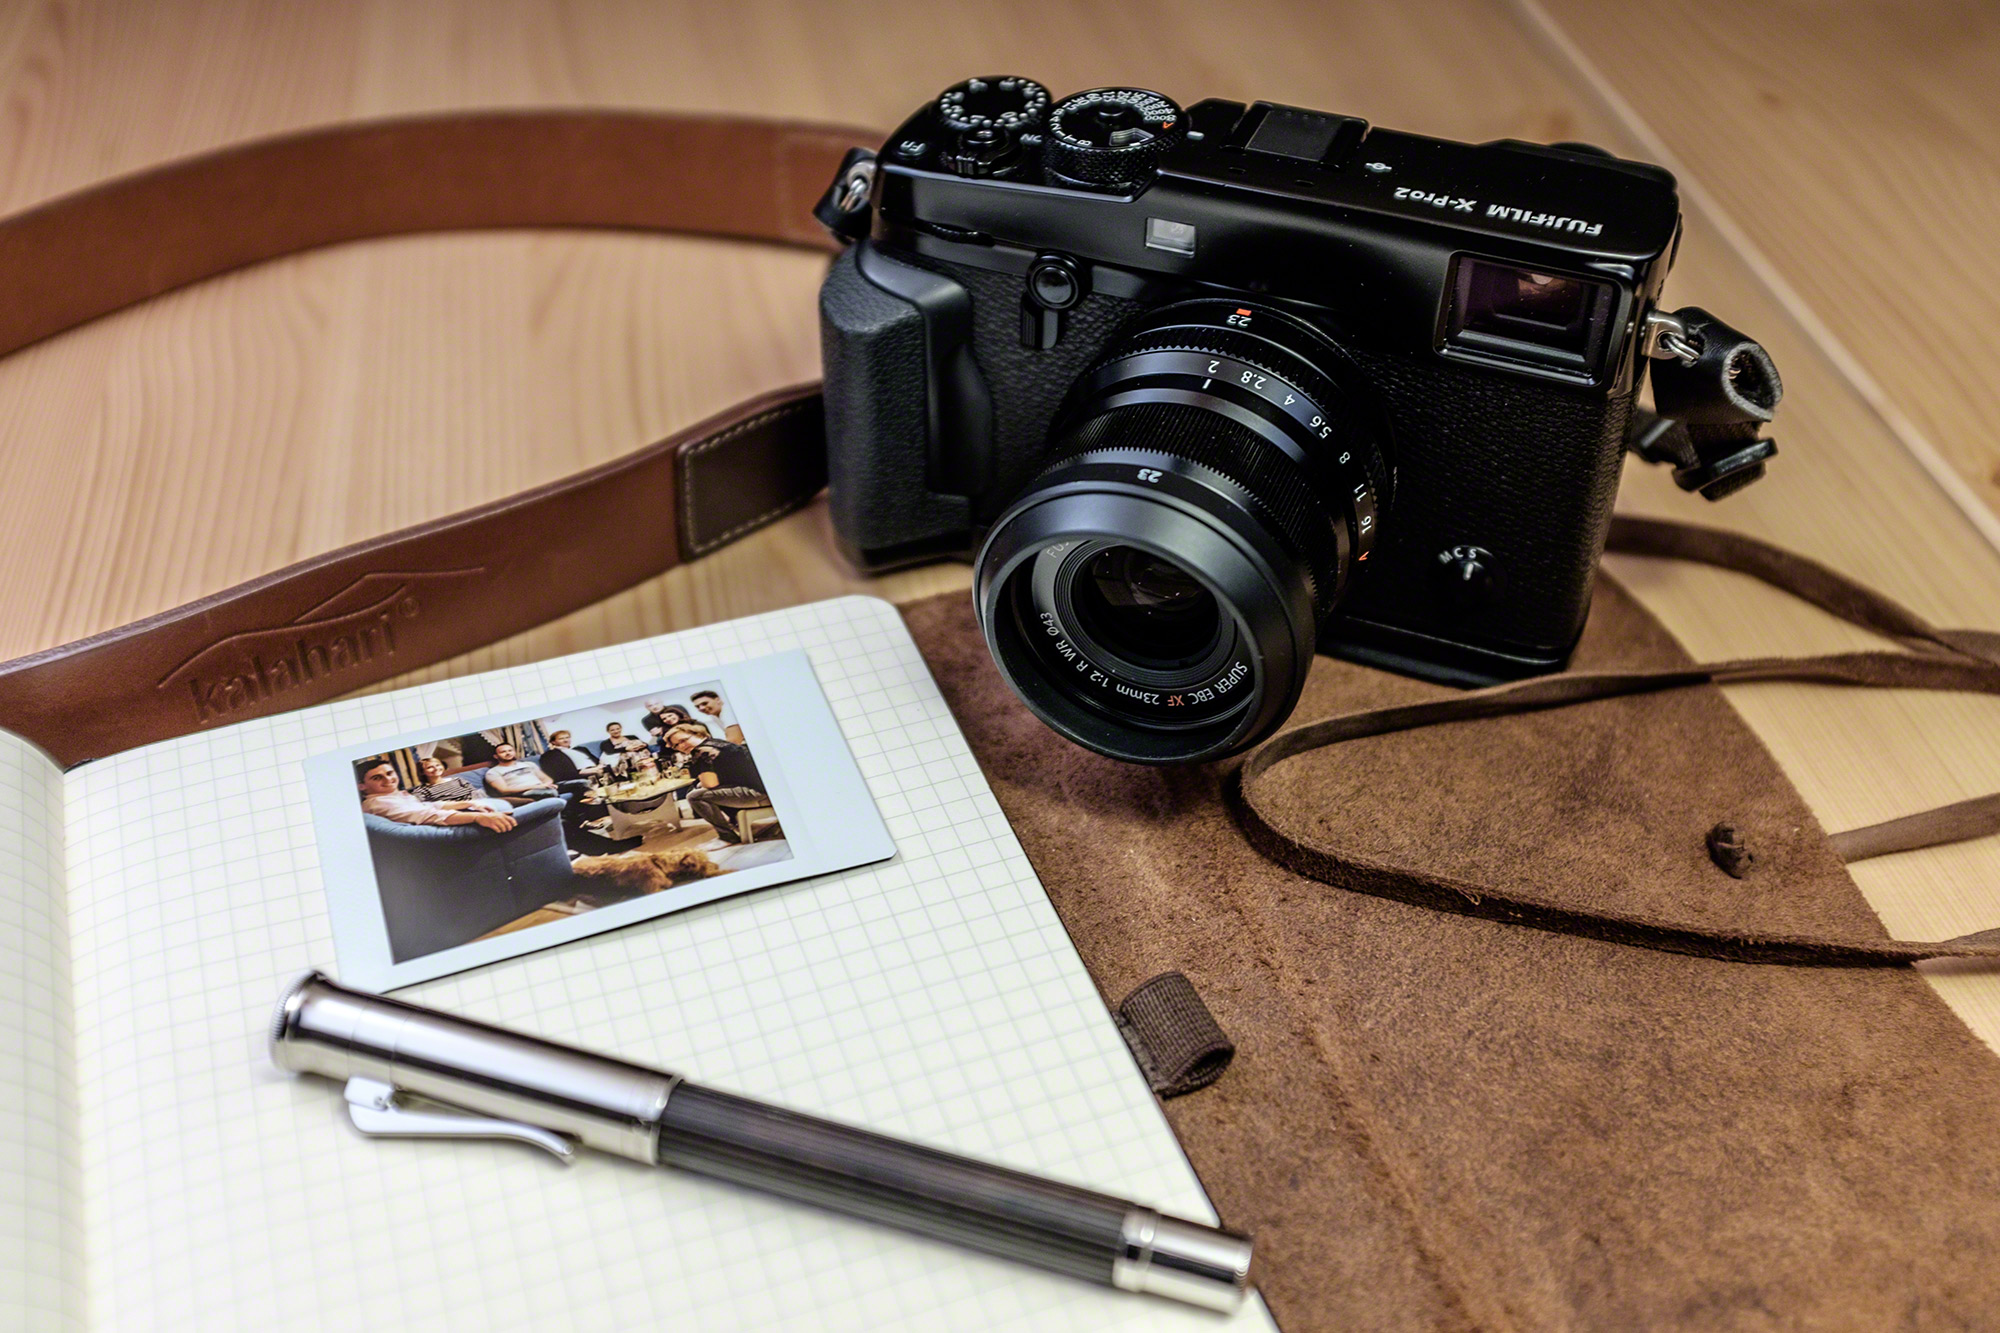 Обзор fujifilm x-t2 для видеооператора - fototips.ru